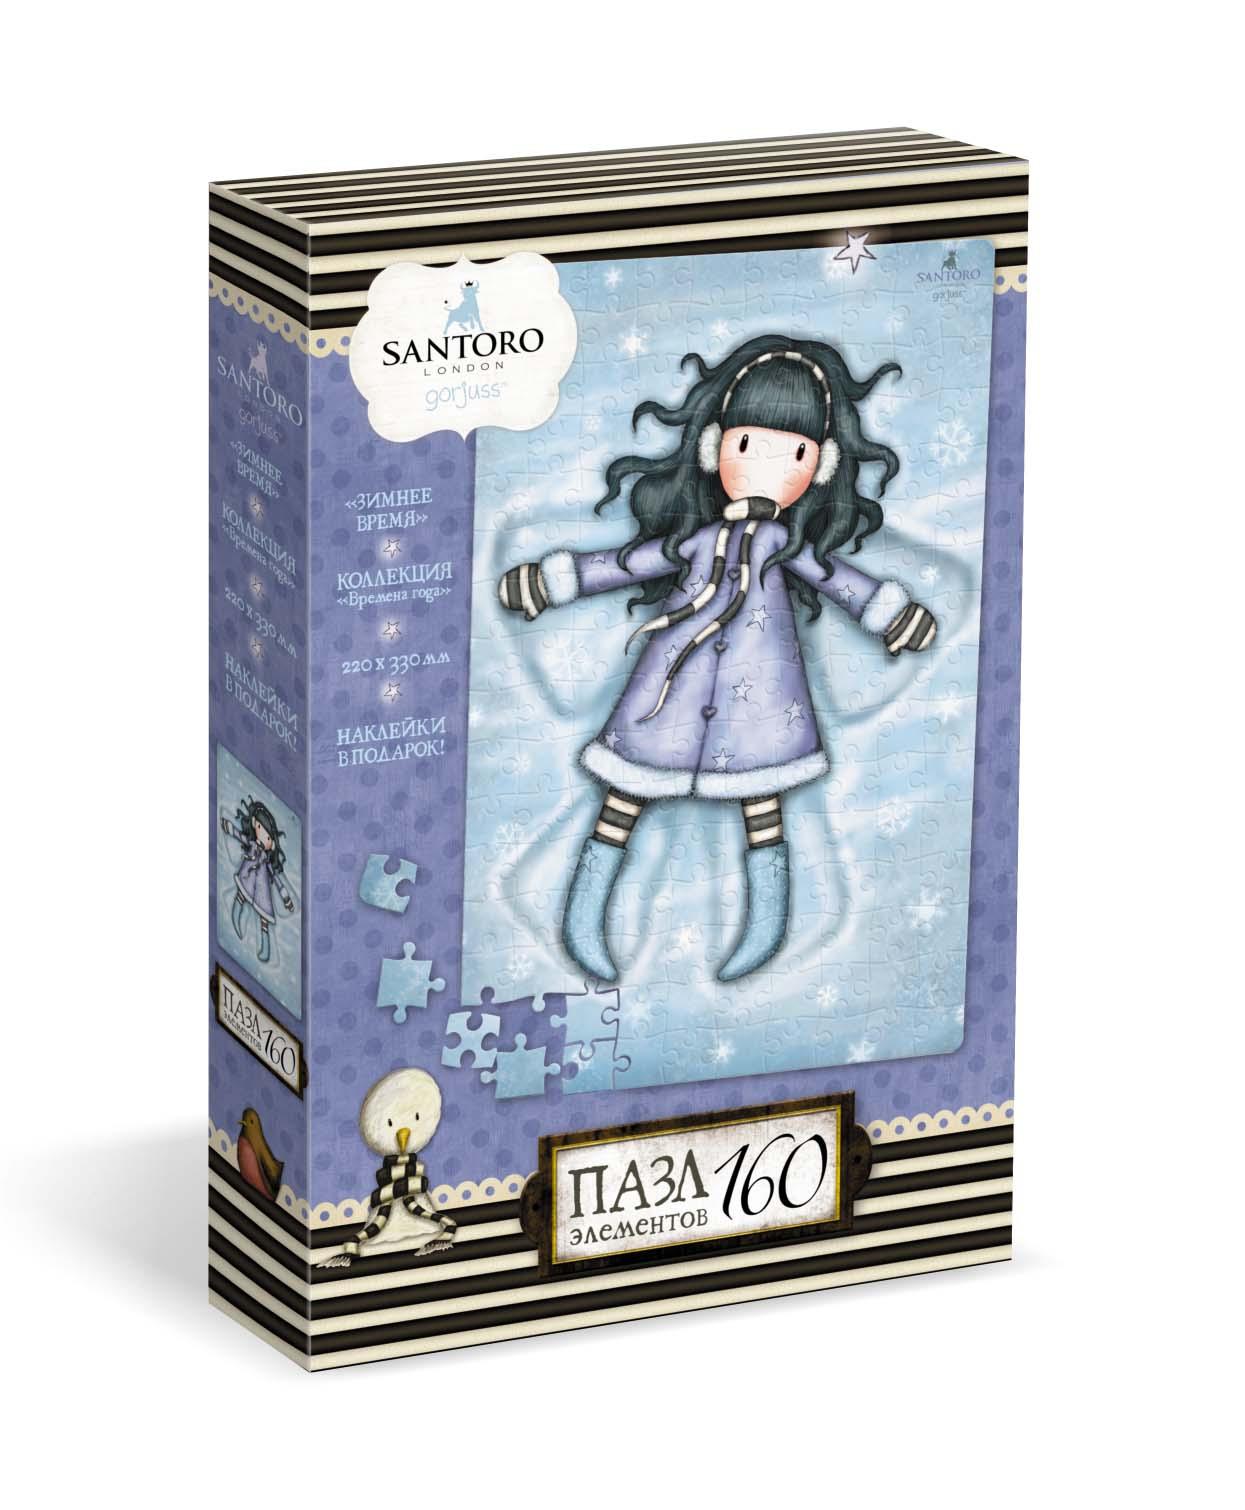 Пазл 160 Origami 04775 Santoro Зимнее время + наклейки